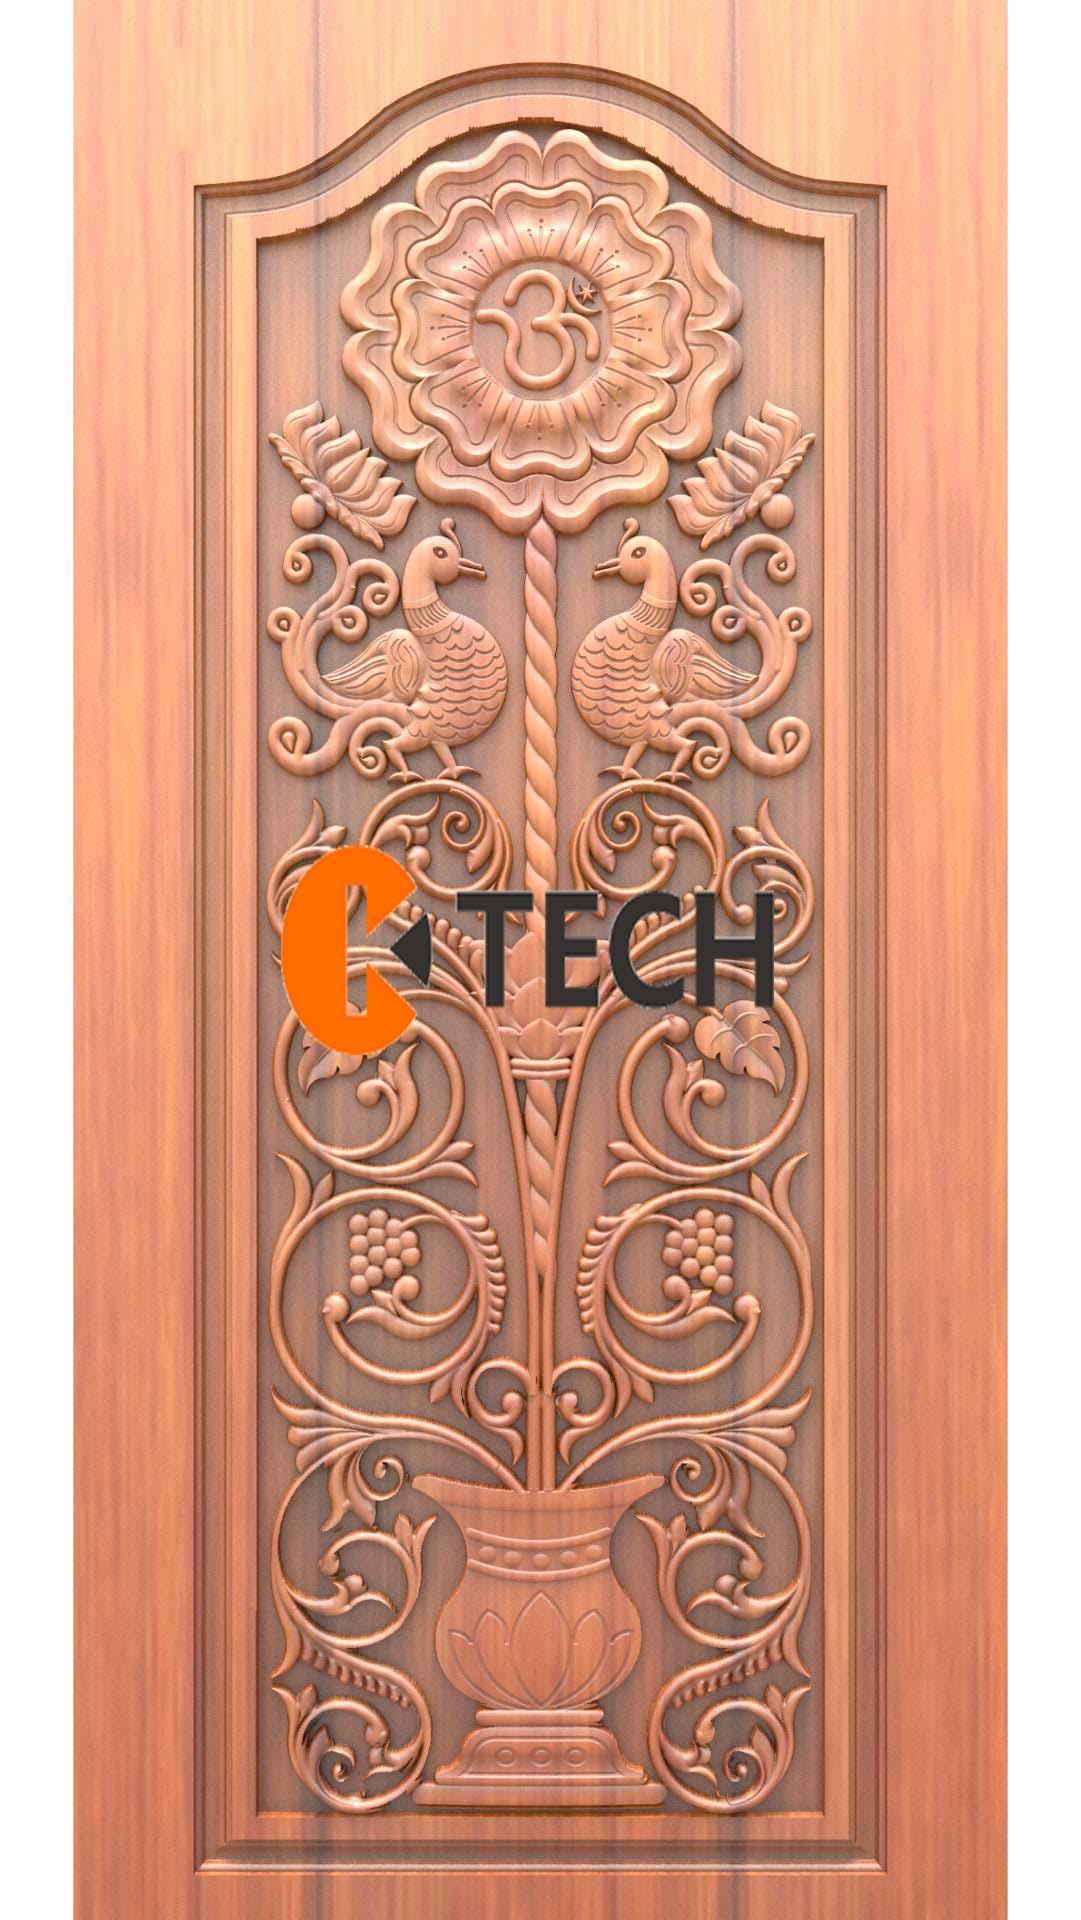 K-TECH CNC Doors Design 15